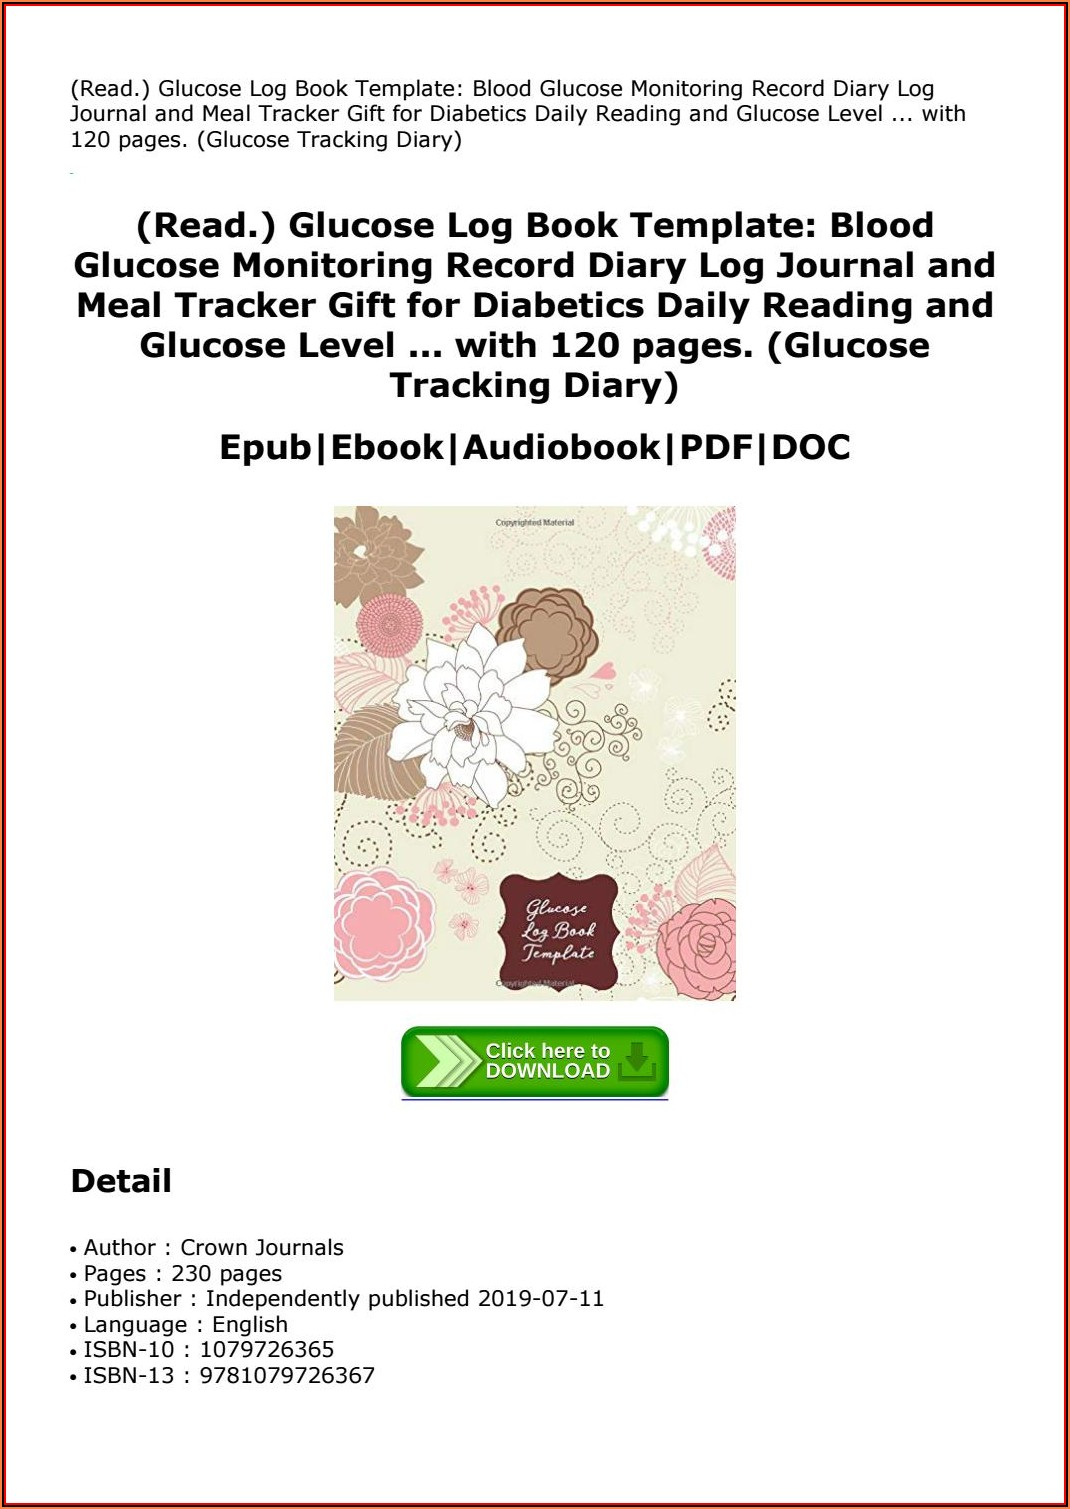 Blood Glucose Log Book Template